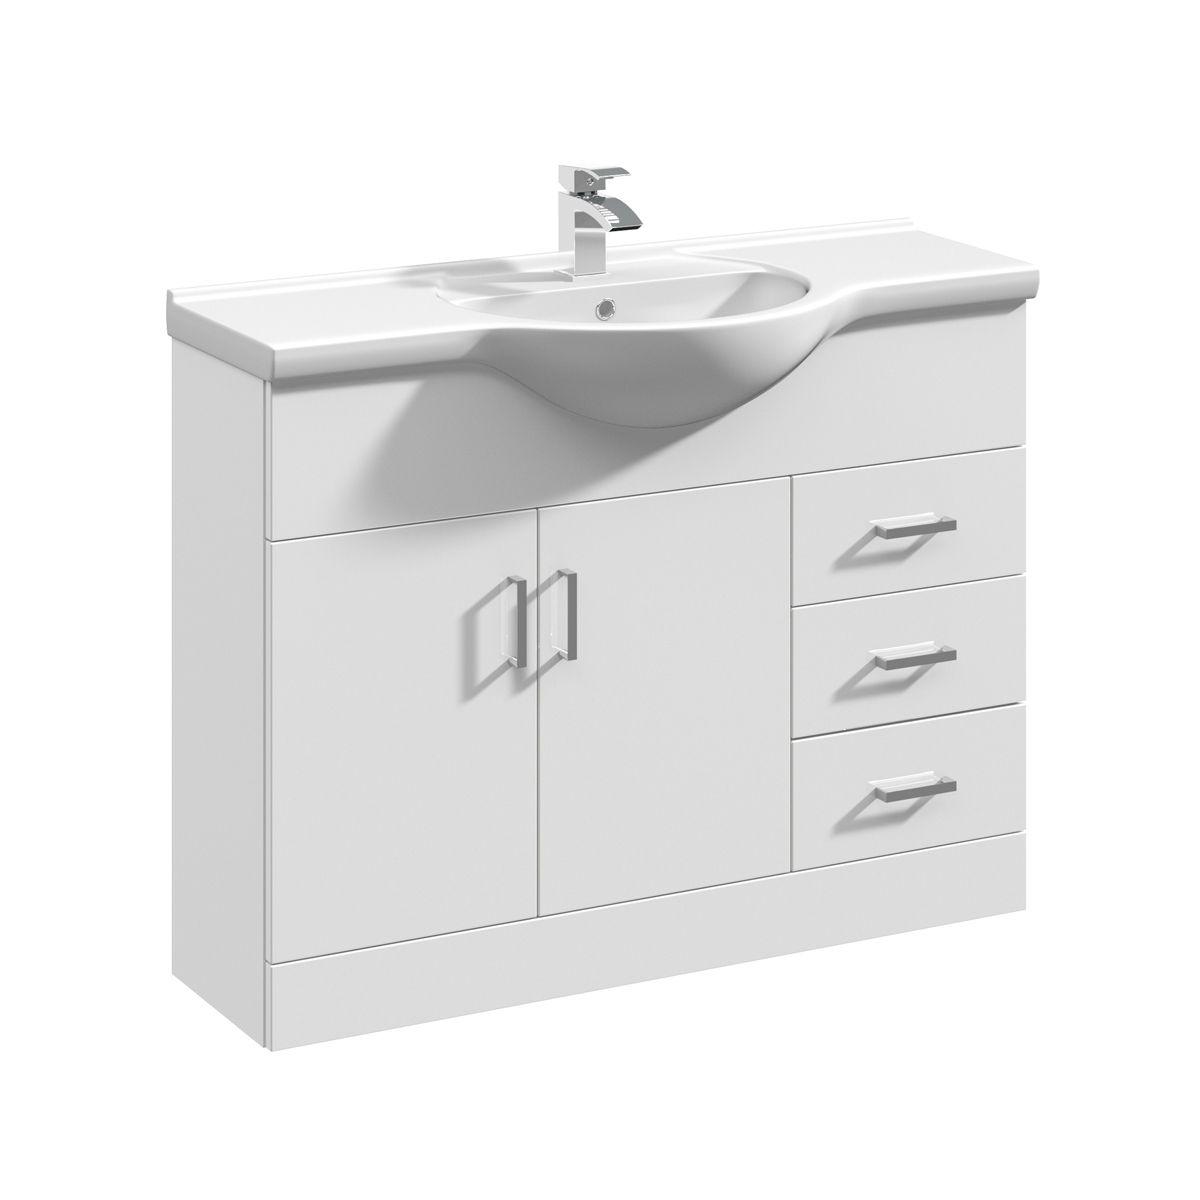 Nuie High Gloss White Vanity Unit 1050mm